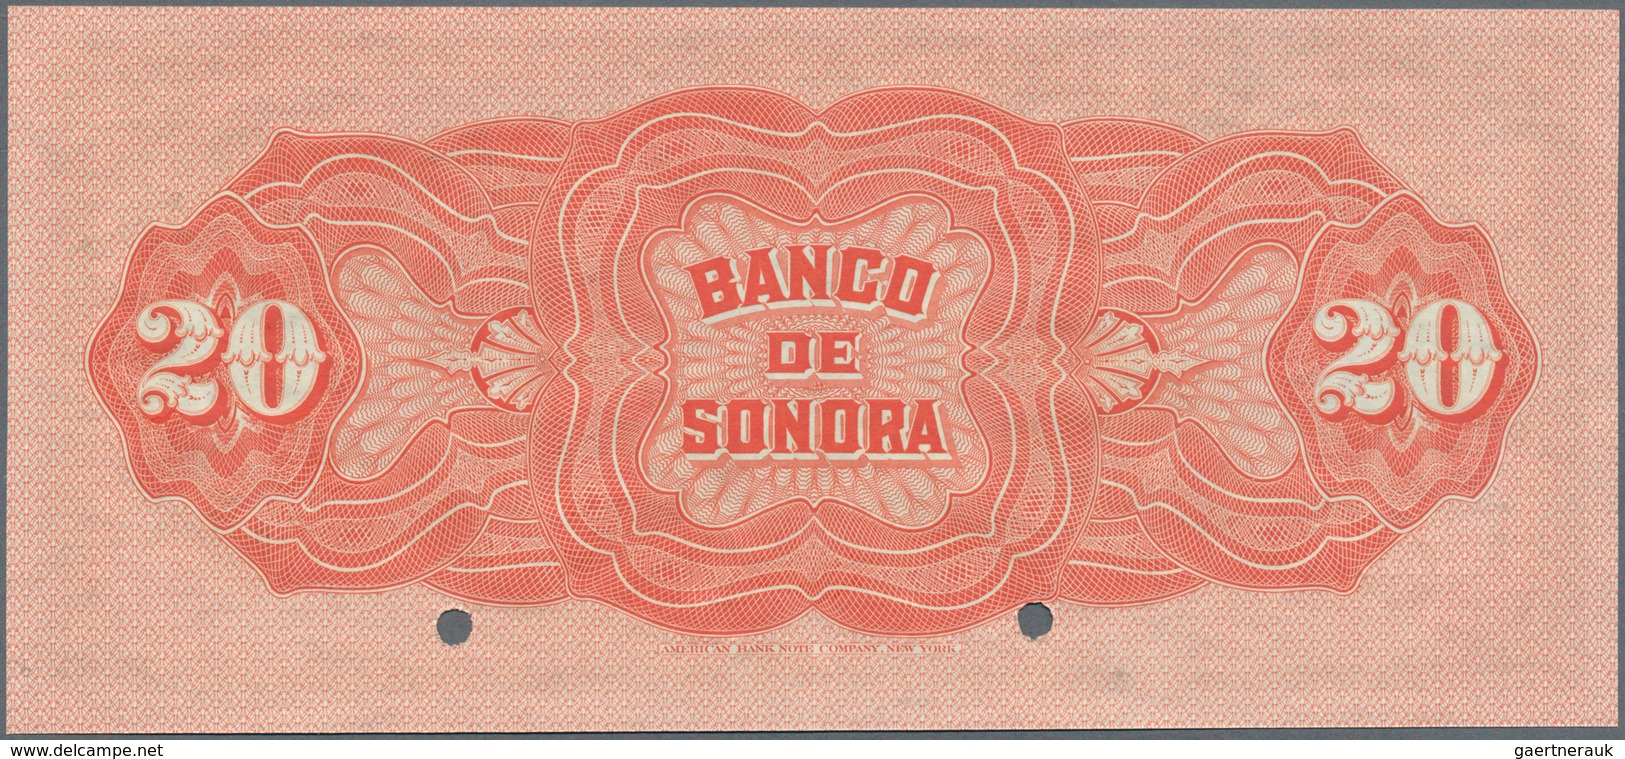 Mexico: El Banco De Sonora 20 Pesos 1899-1911 SPECIMEN, P.S421s, Punch Hole Cancellation And Red Ove - Mexico